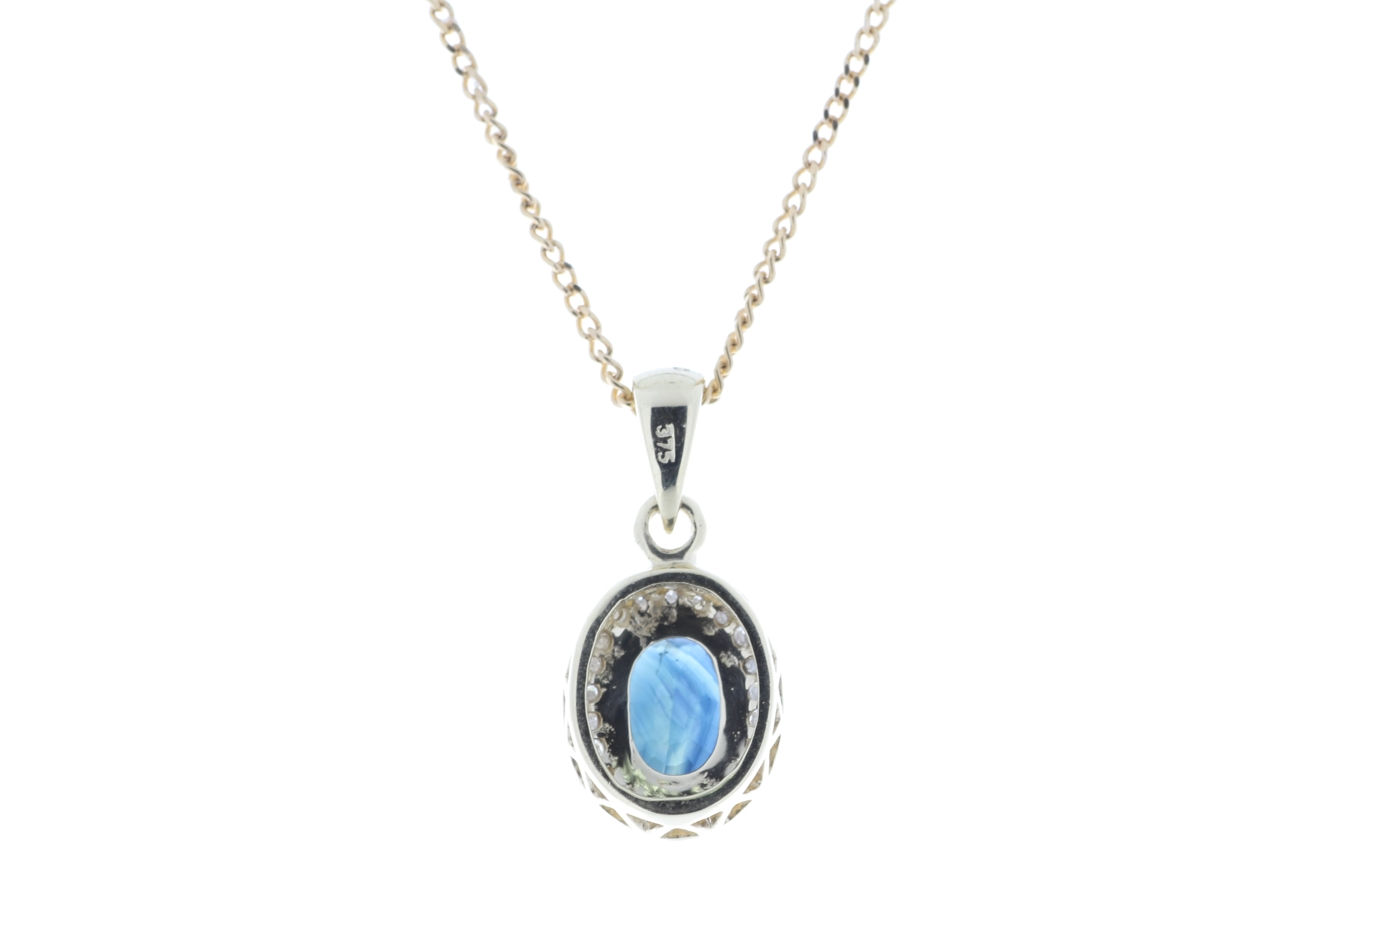 Lot 48 - 9ct Yellow Gold Diamond And Sapphire Pendant 0.11 Carats